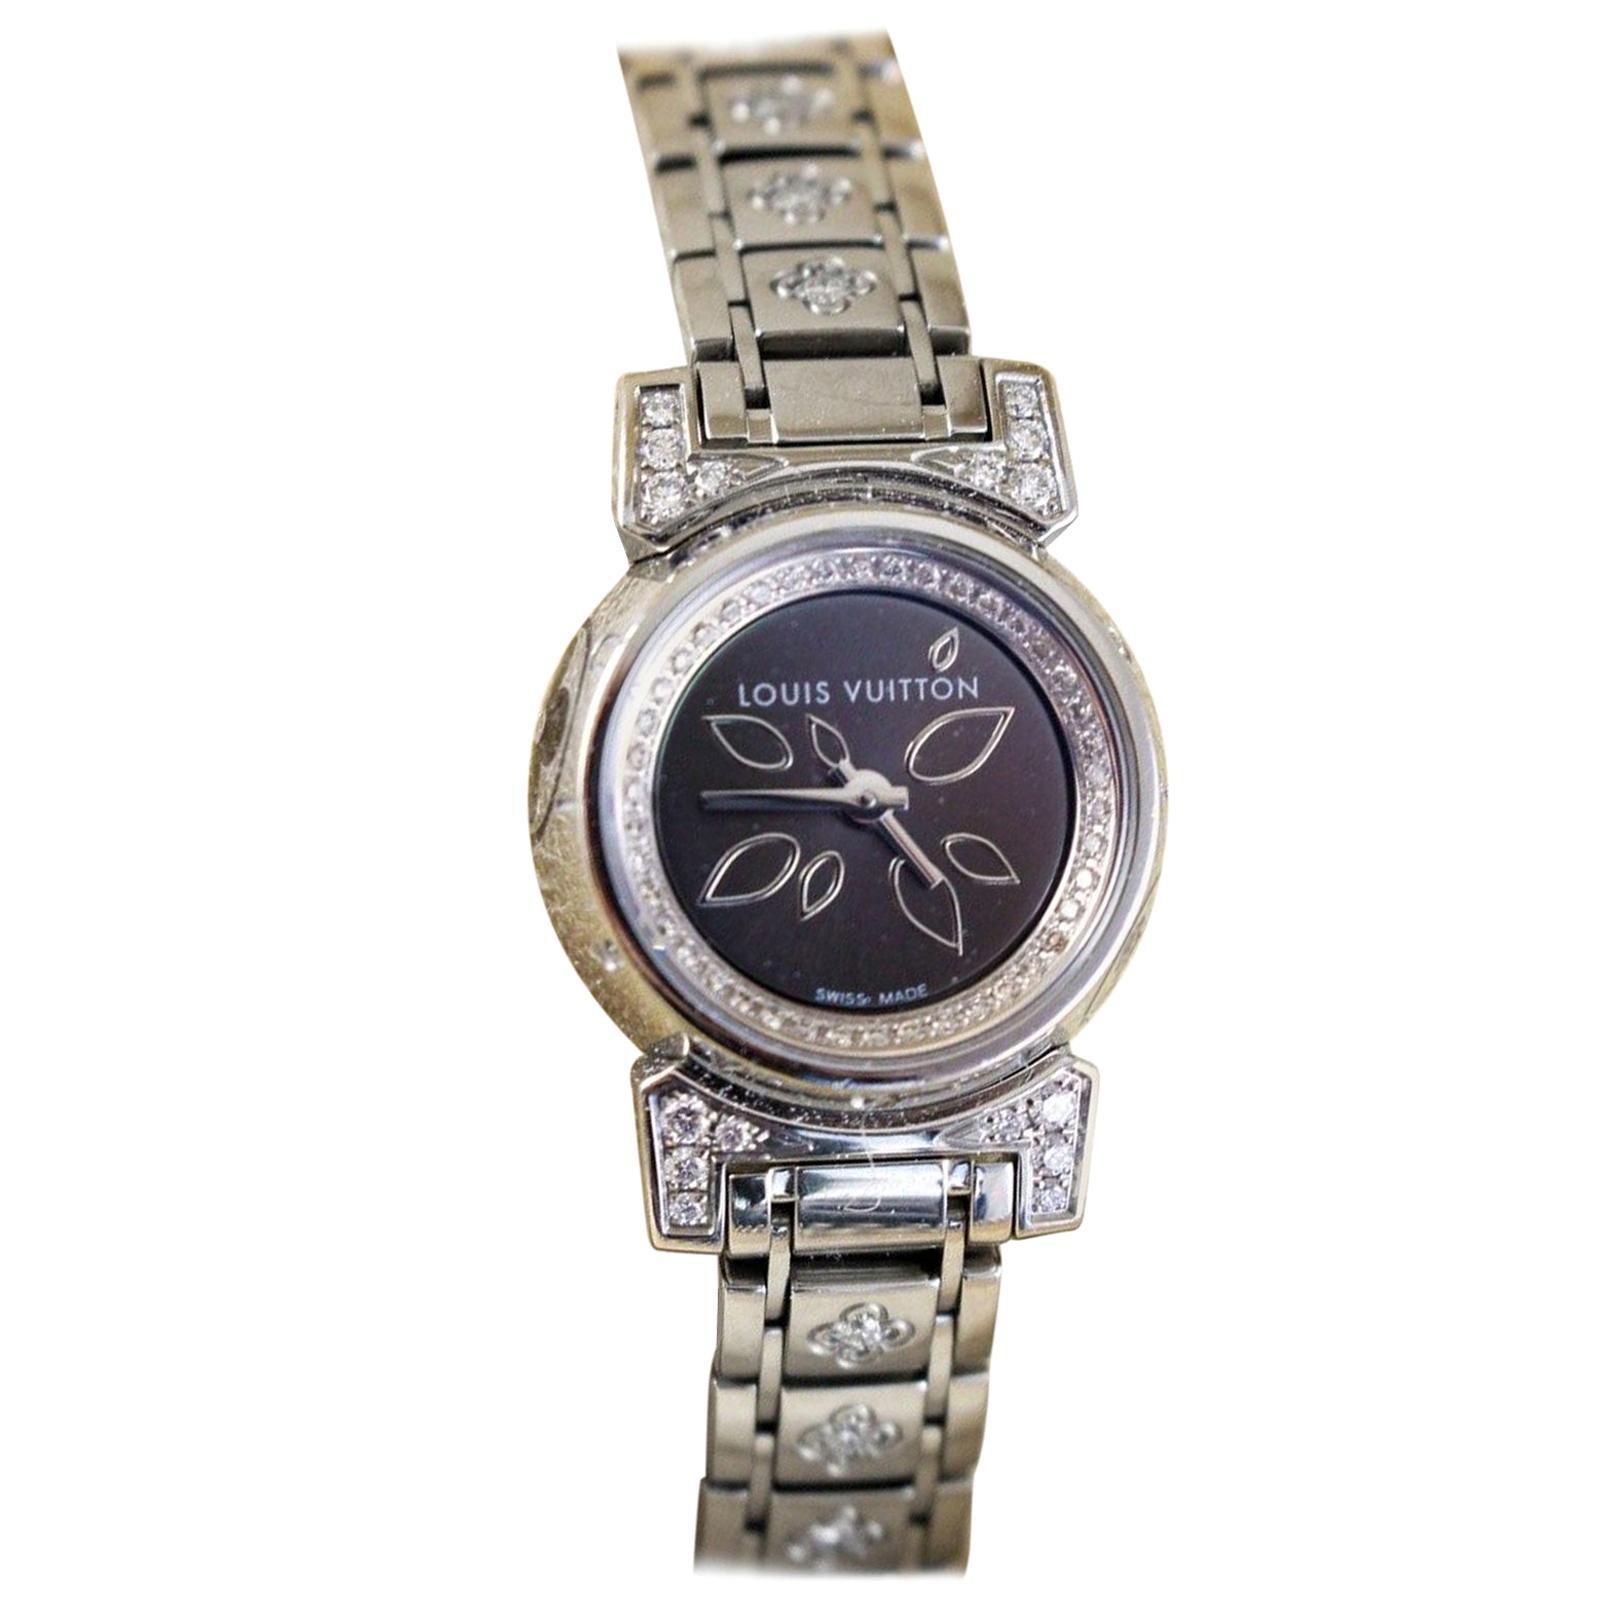 Louis Vuitton Tambour Stainless Steel Diamonds Ladies Watch